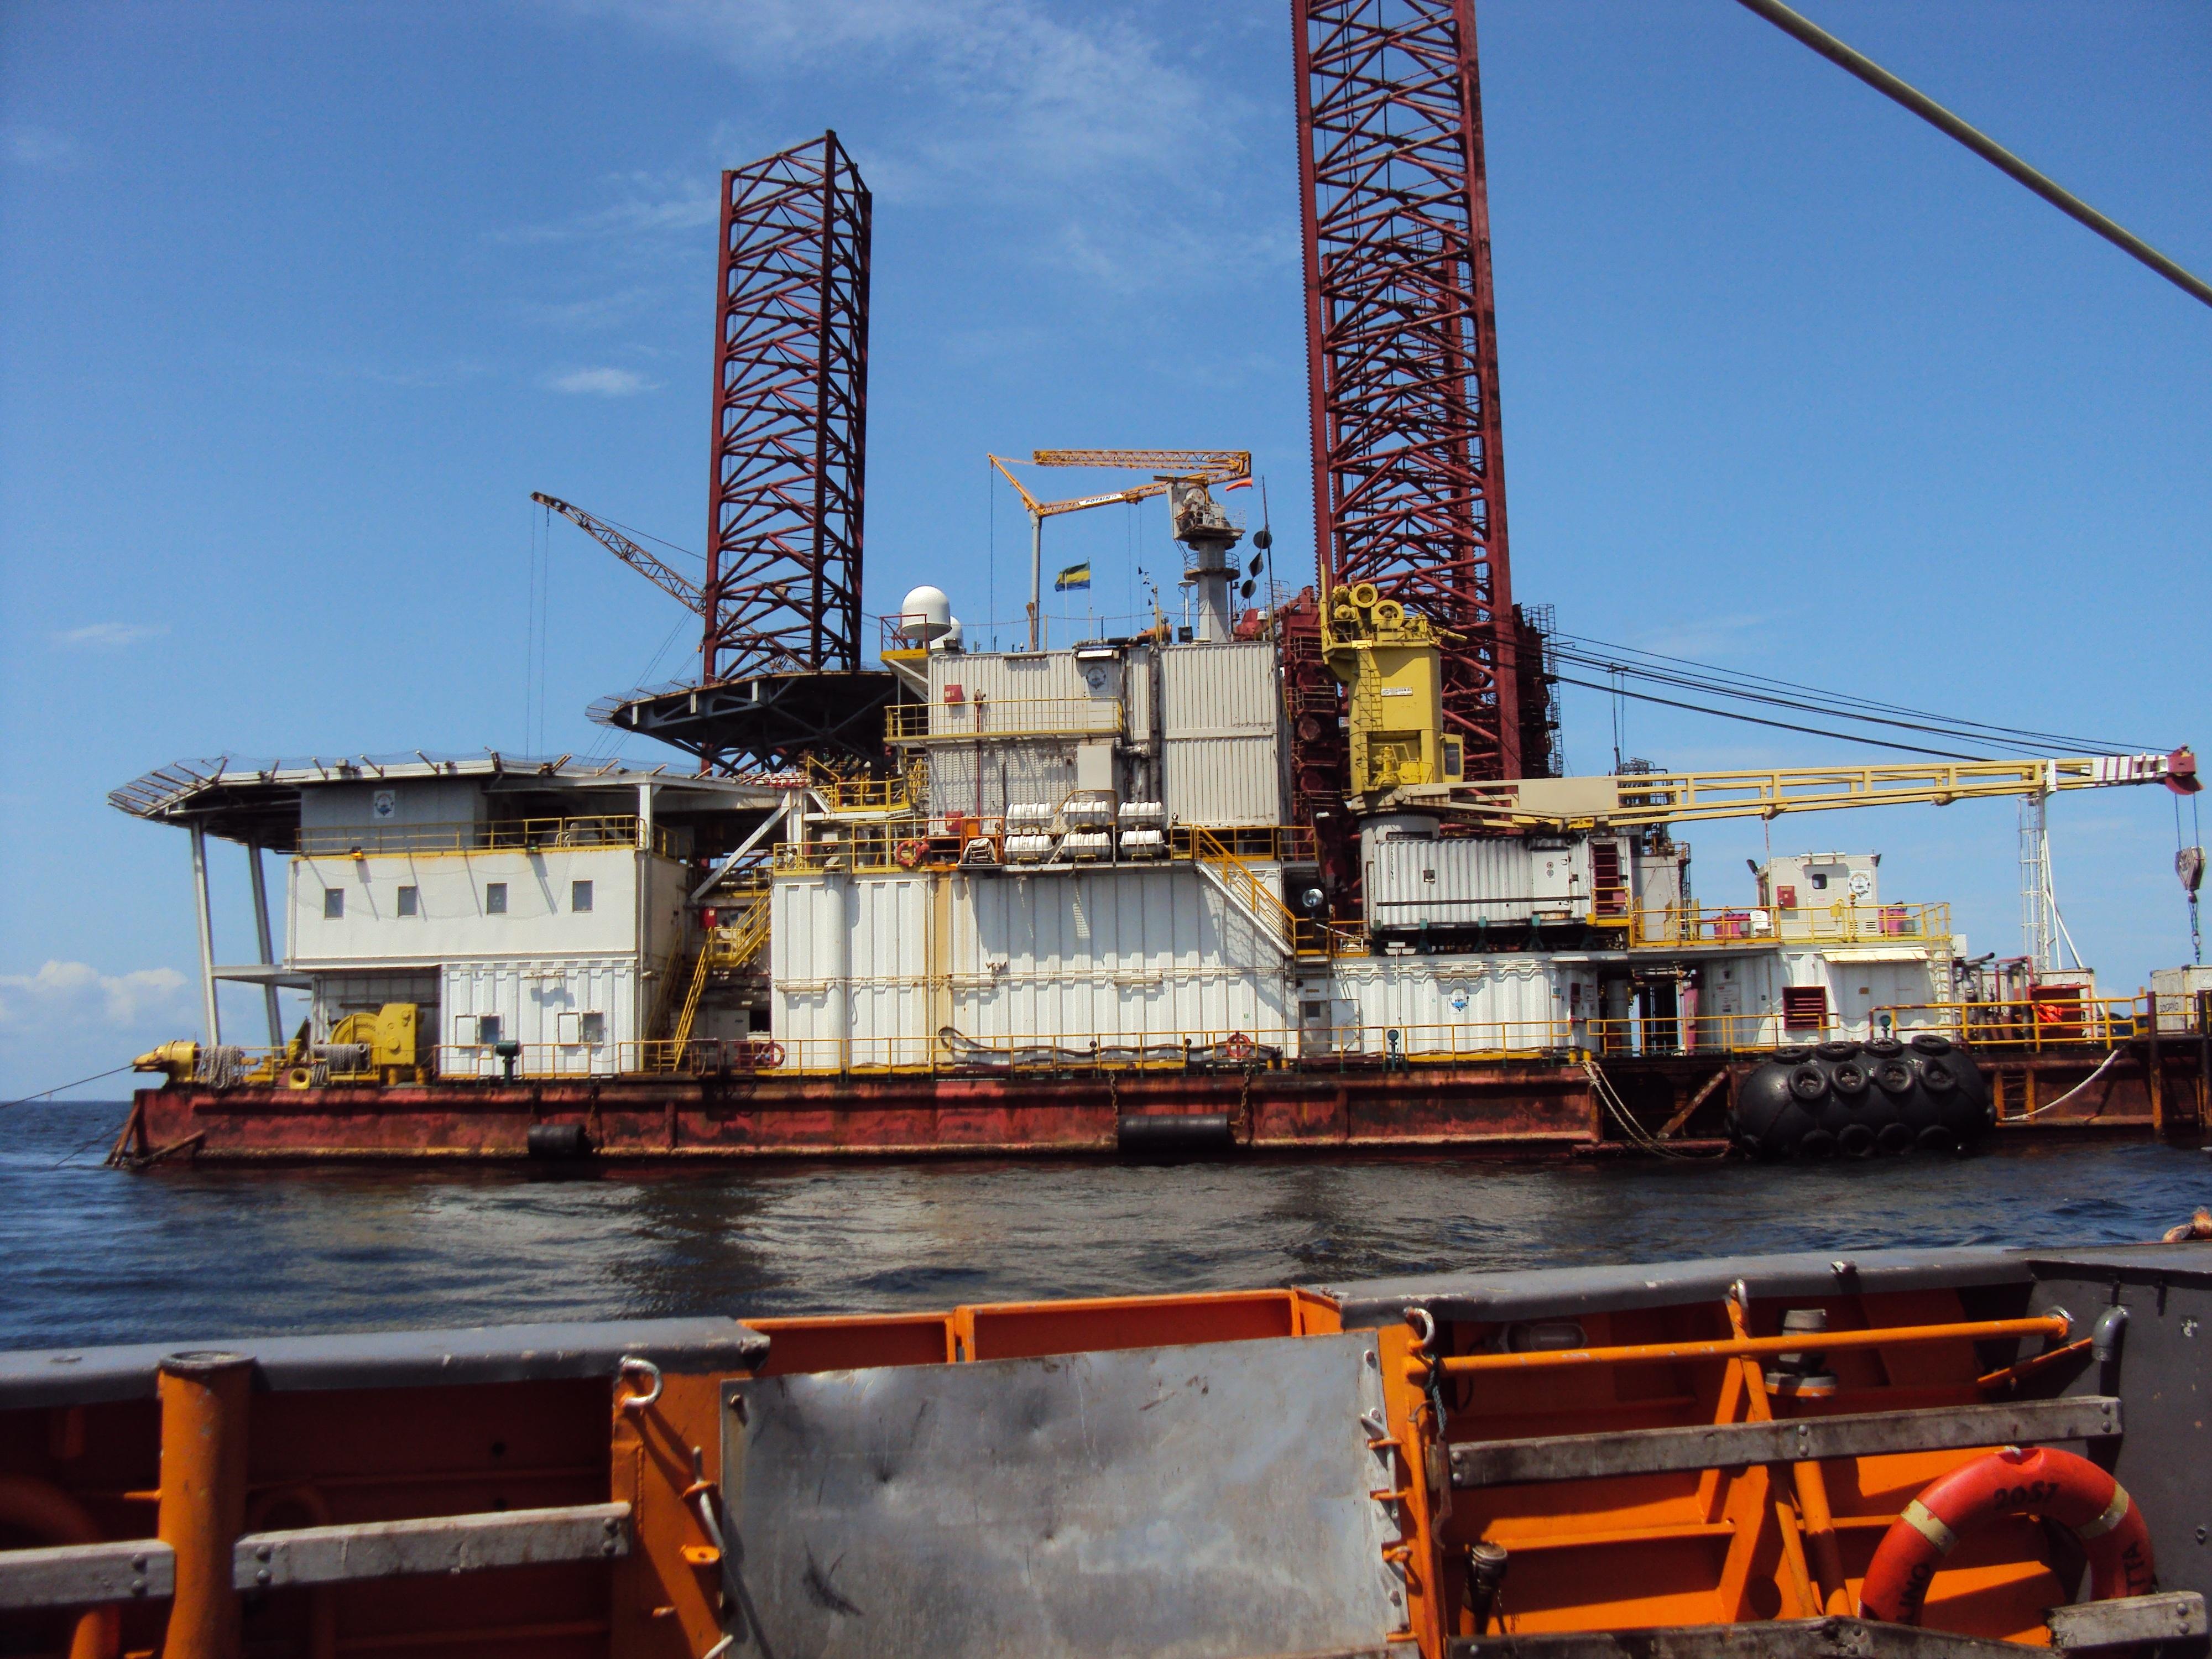 Free Images : ship, travel, vehicle, africa, platform, industry